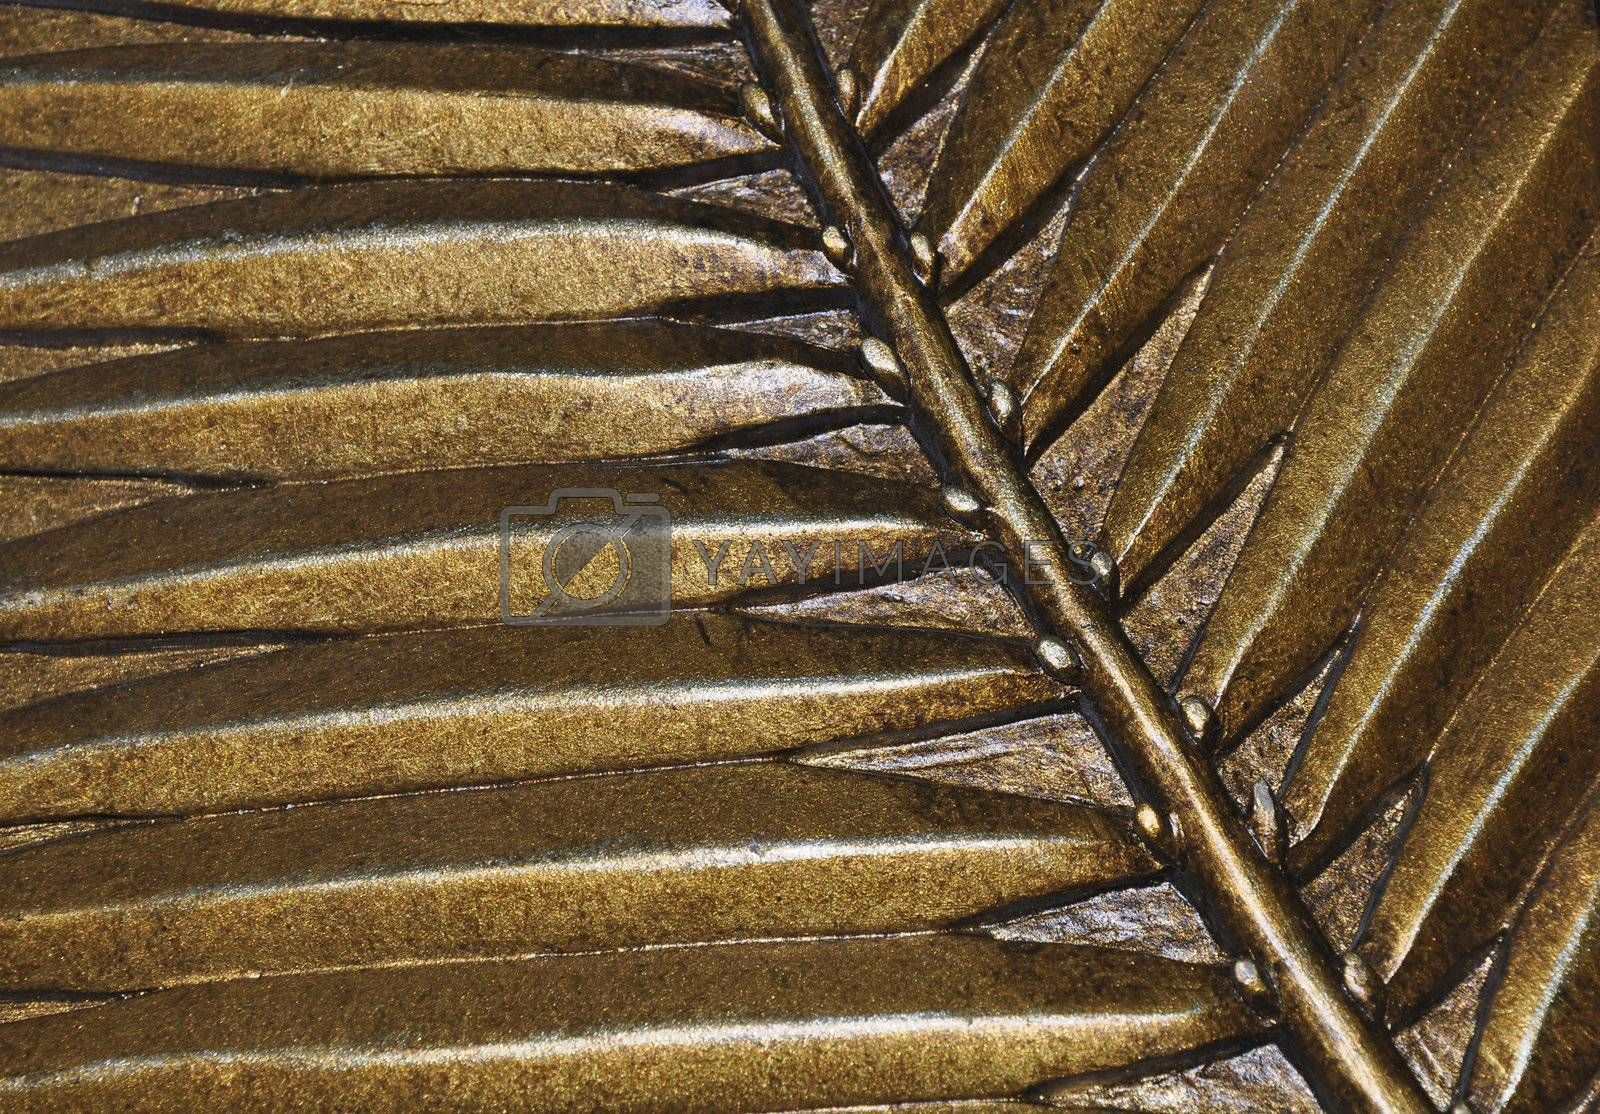 closeup view of gold metallic leaves artwork